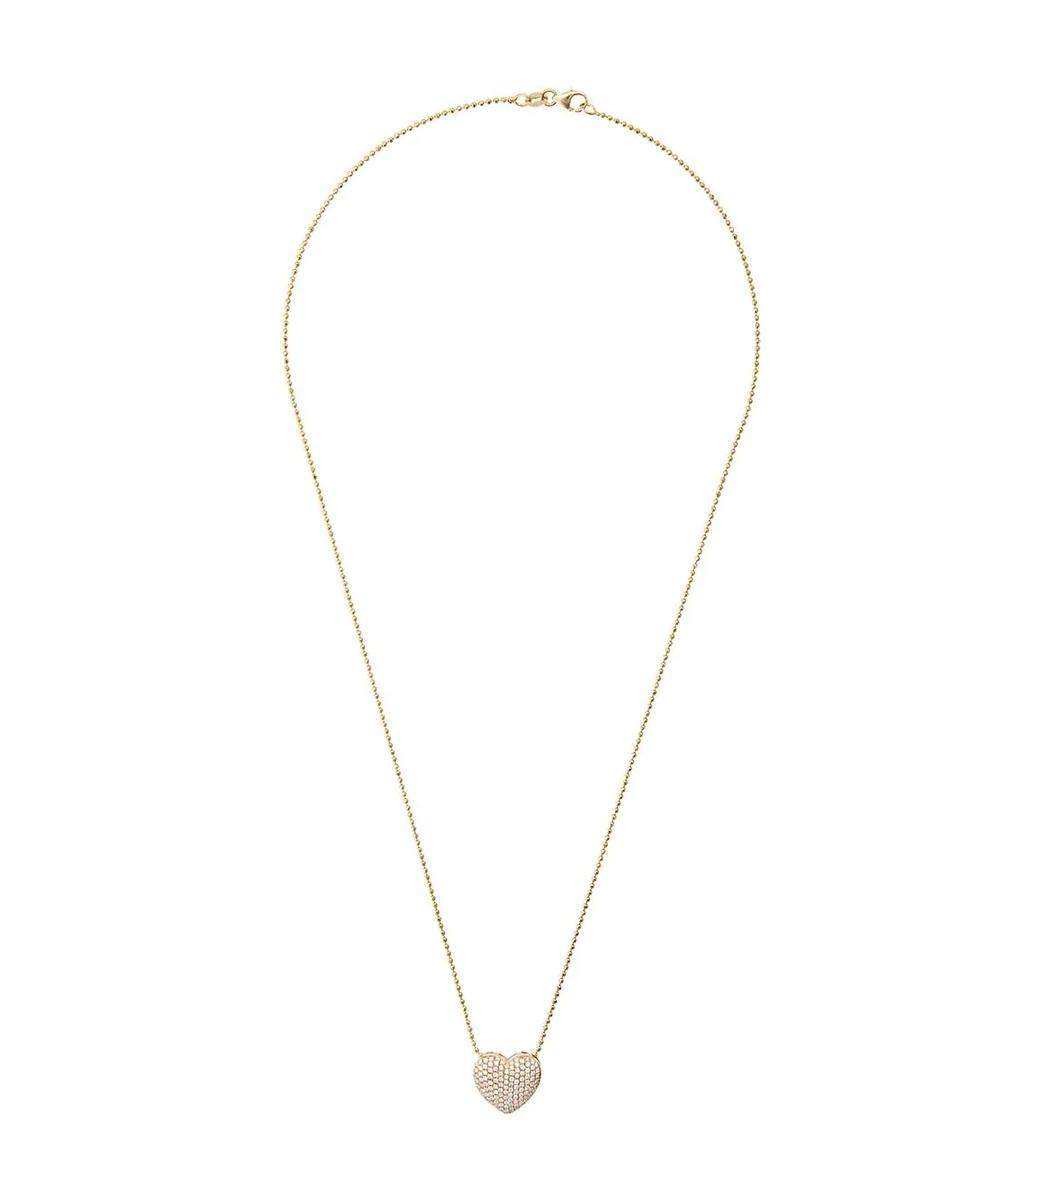 Anita Ko Gold Diamond Heart Necklace